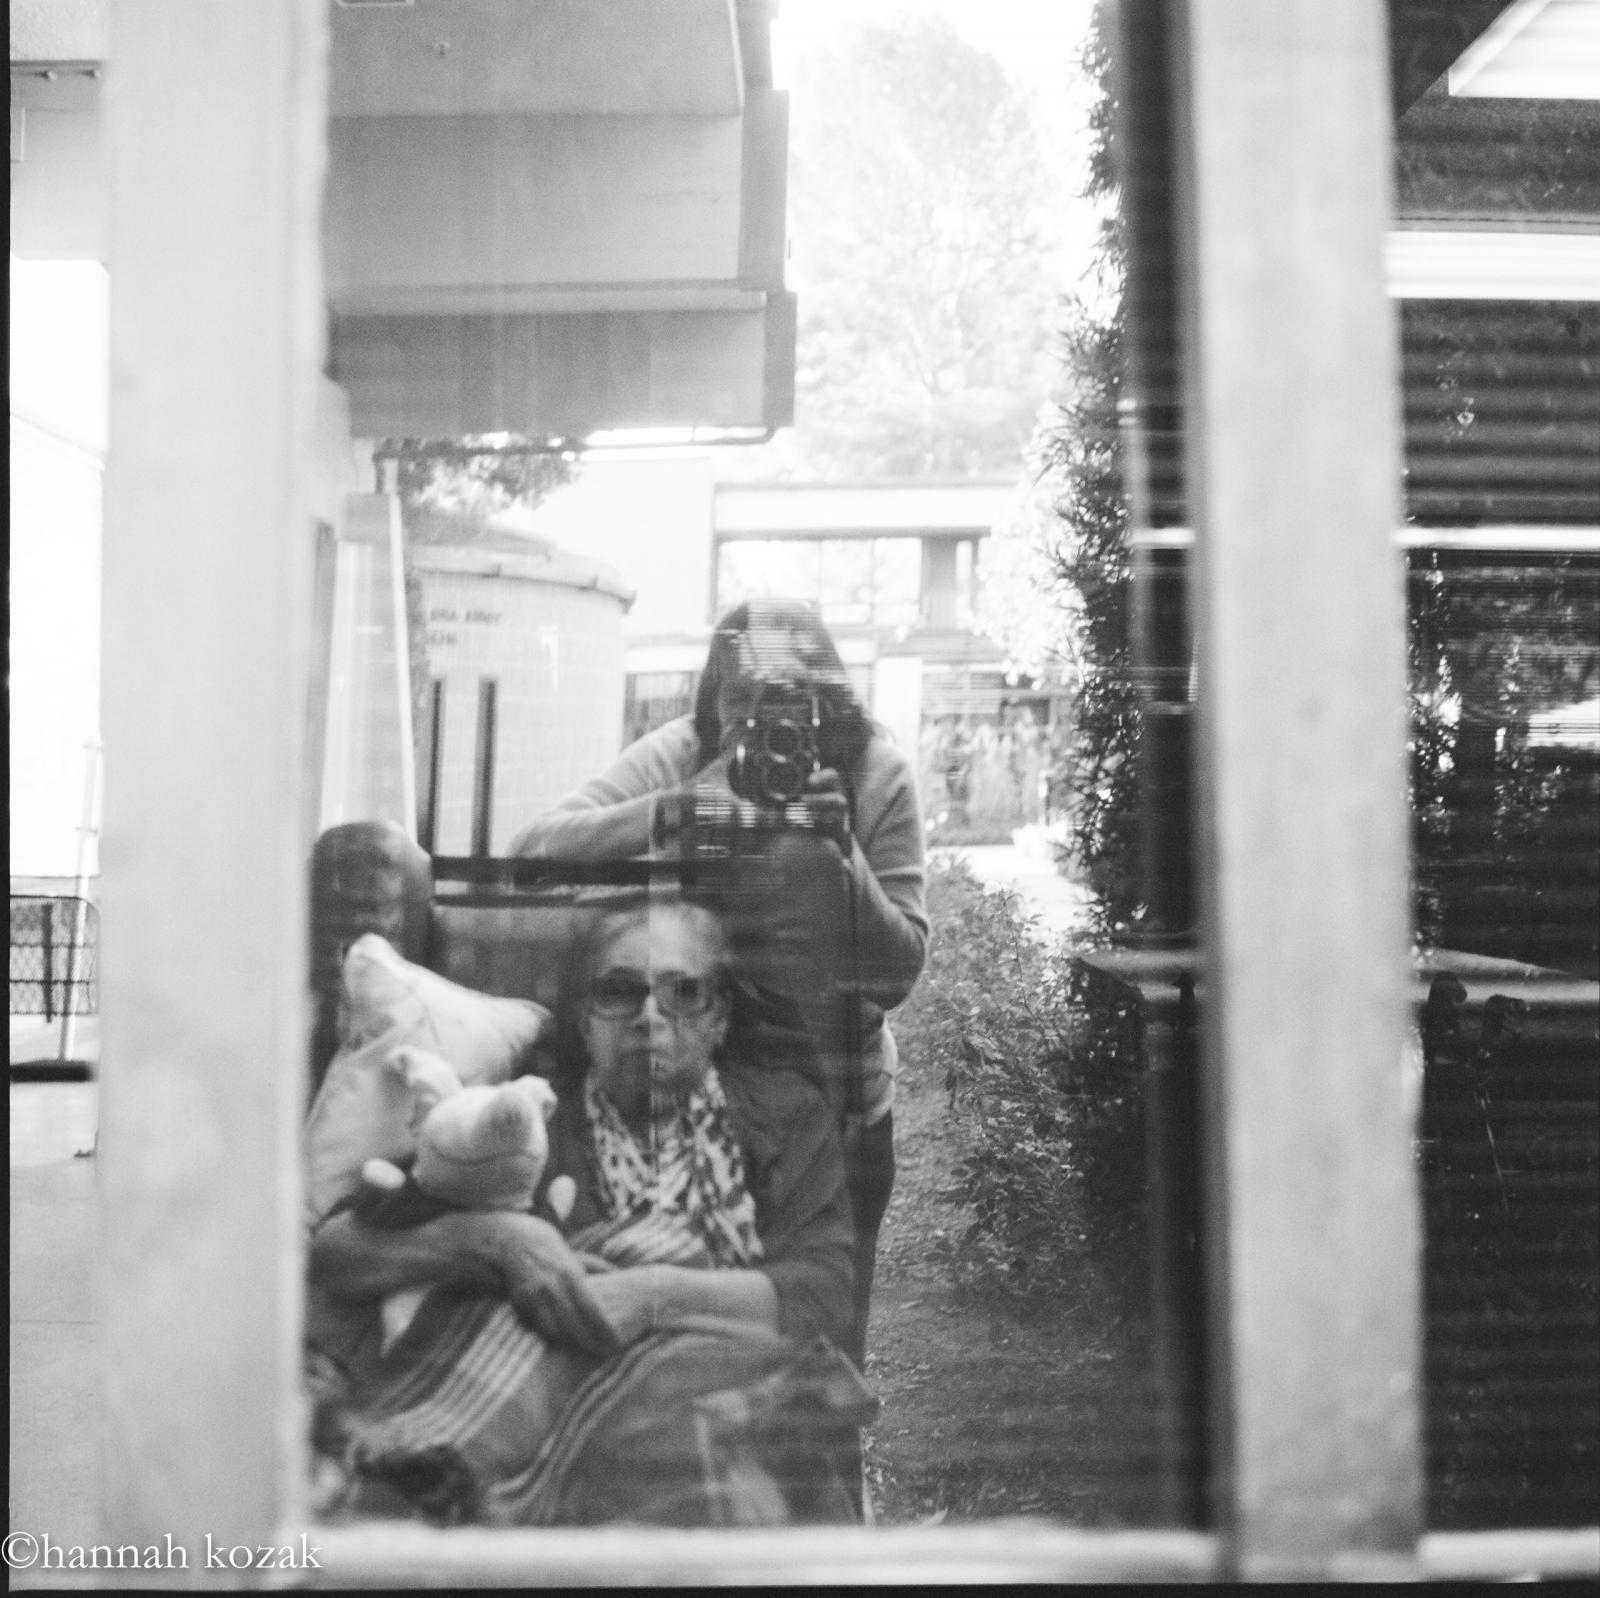 Photography image - Loading Hannah-Kozak-He-Threw-the-Last-Punch-Too-Hard-14-Feb-2008.jpg